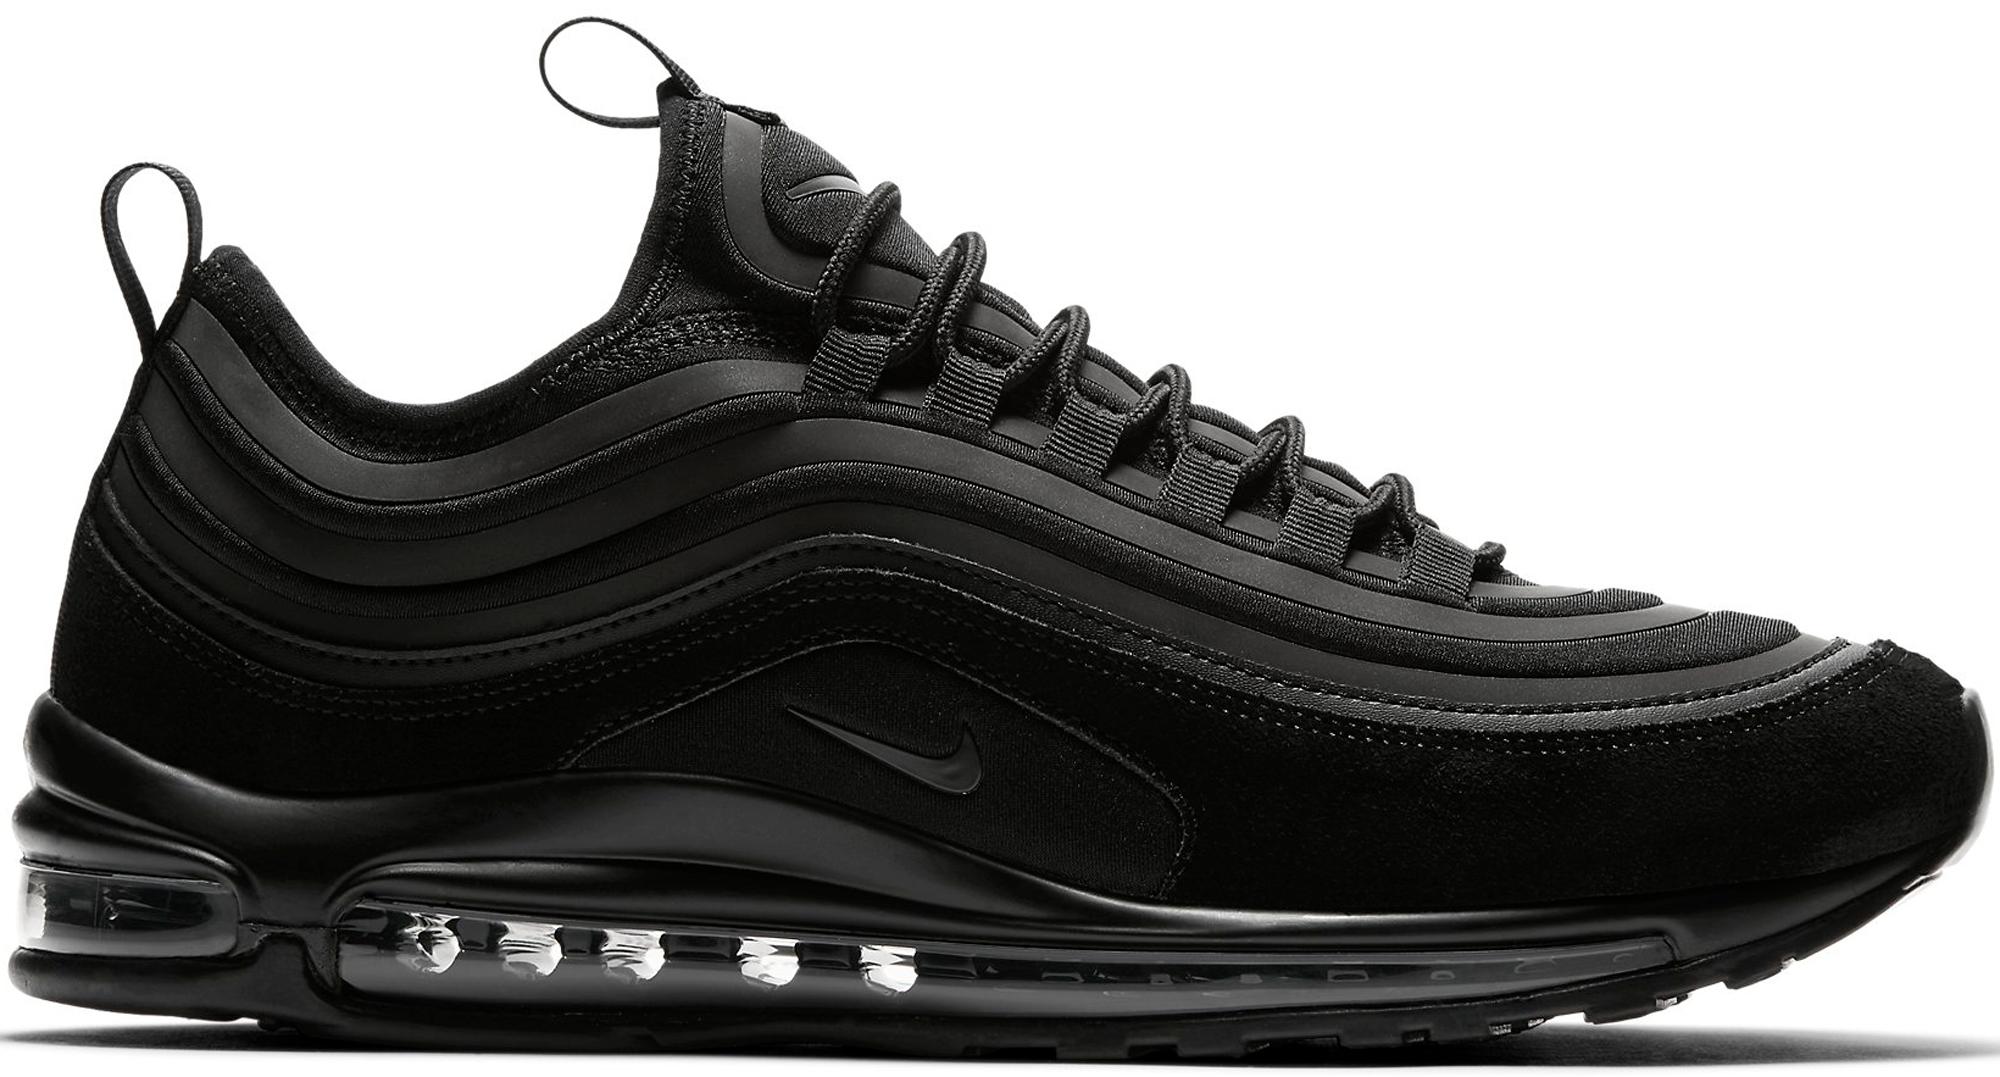 super cute 4231a 330b9 Nike Cheetah Print Sneakers. air max price in sweden